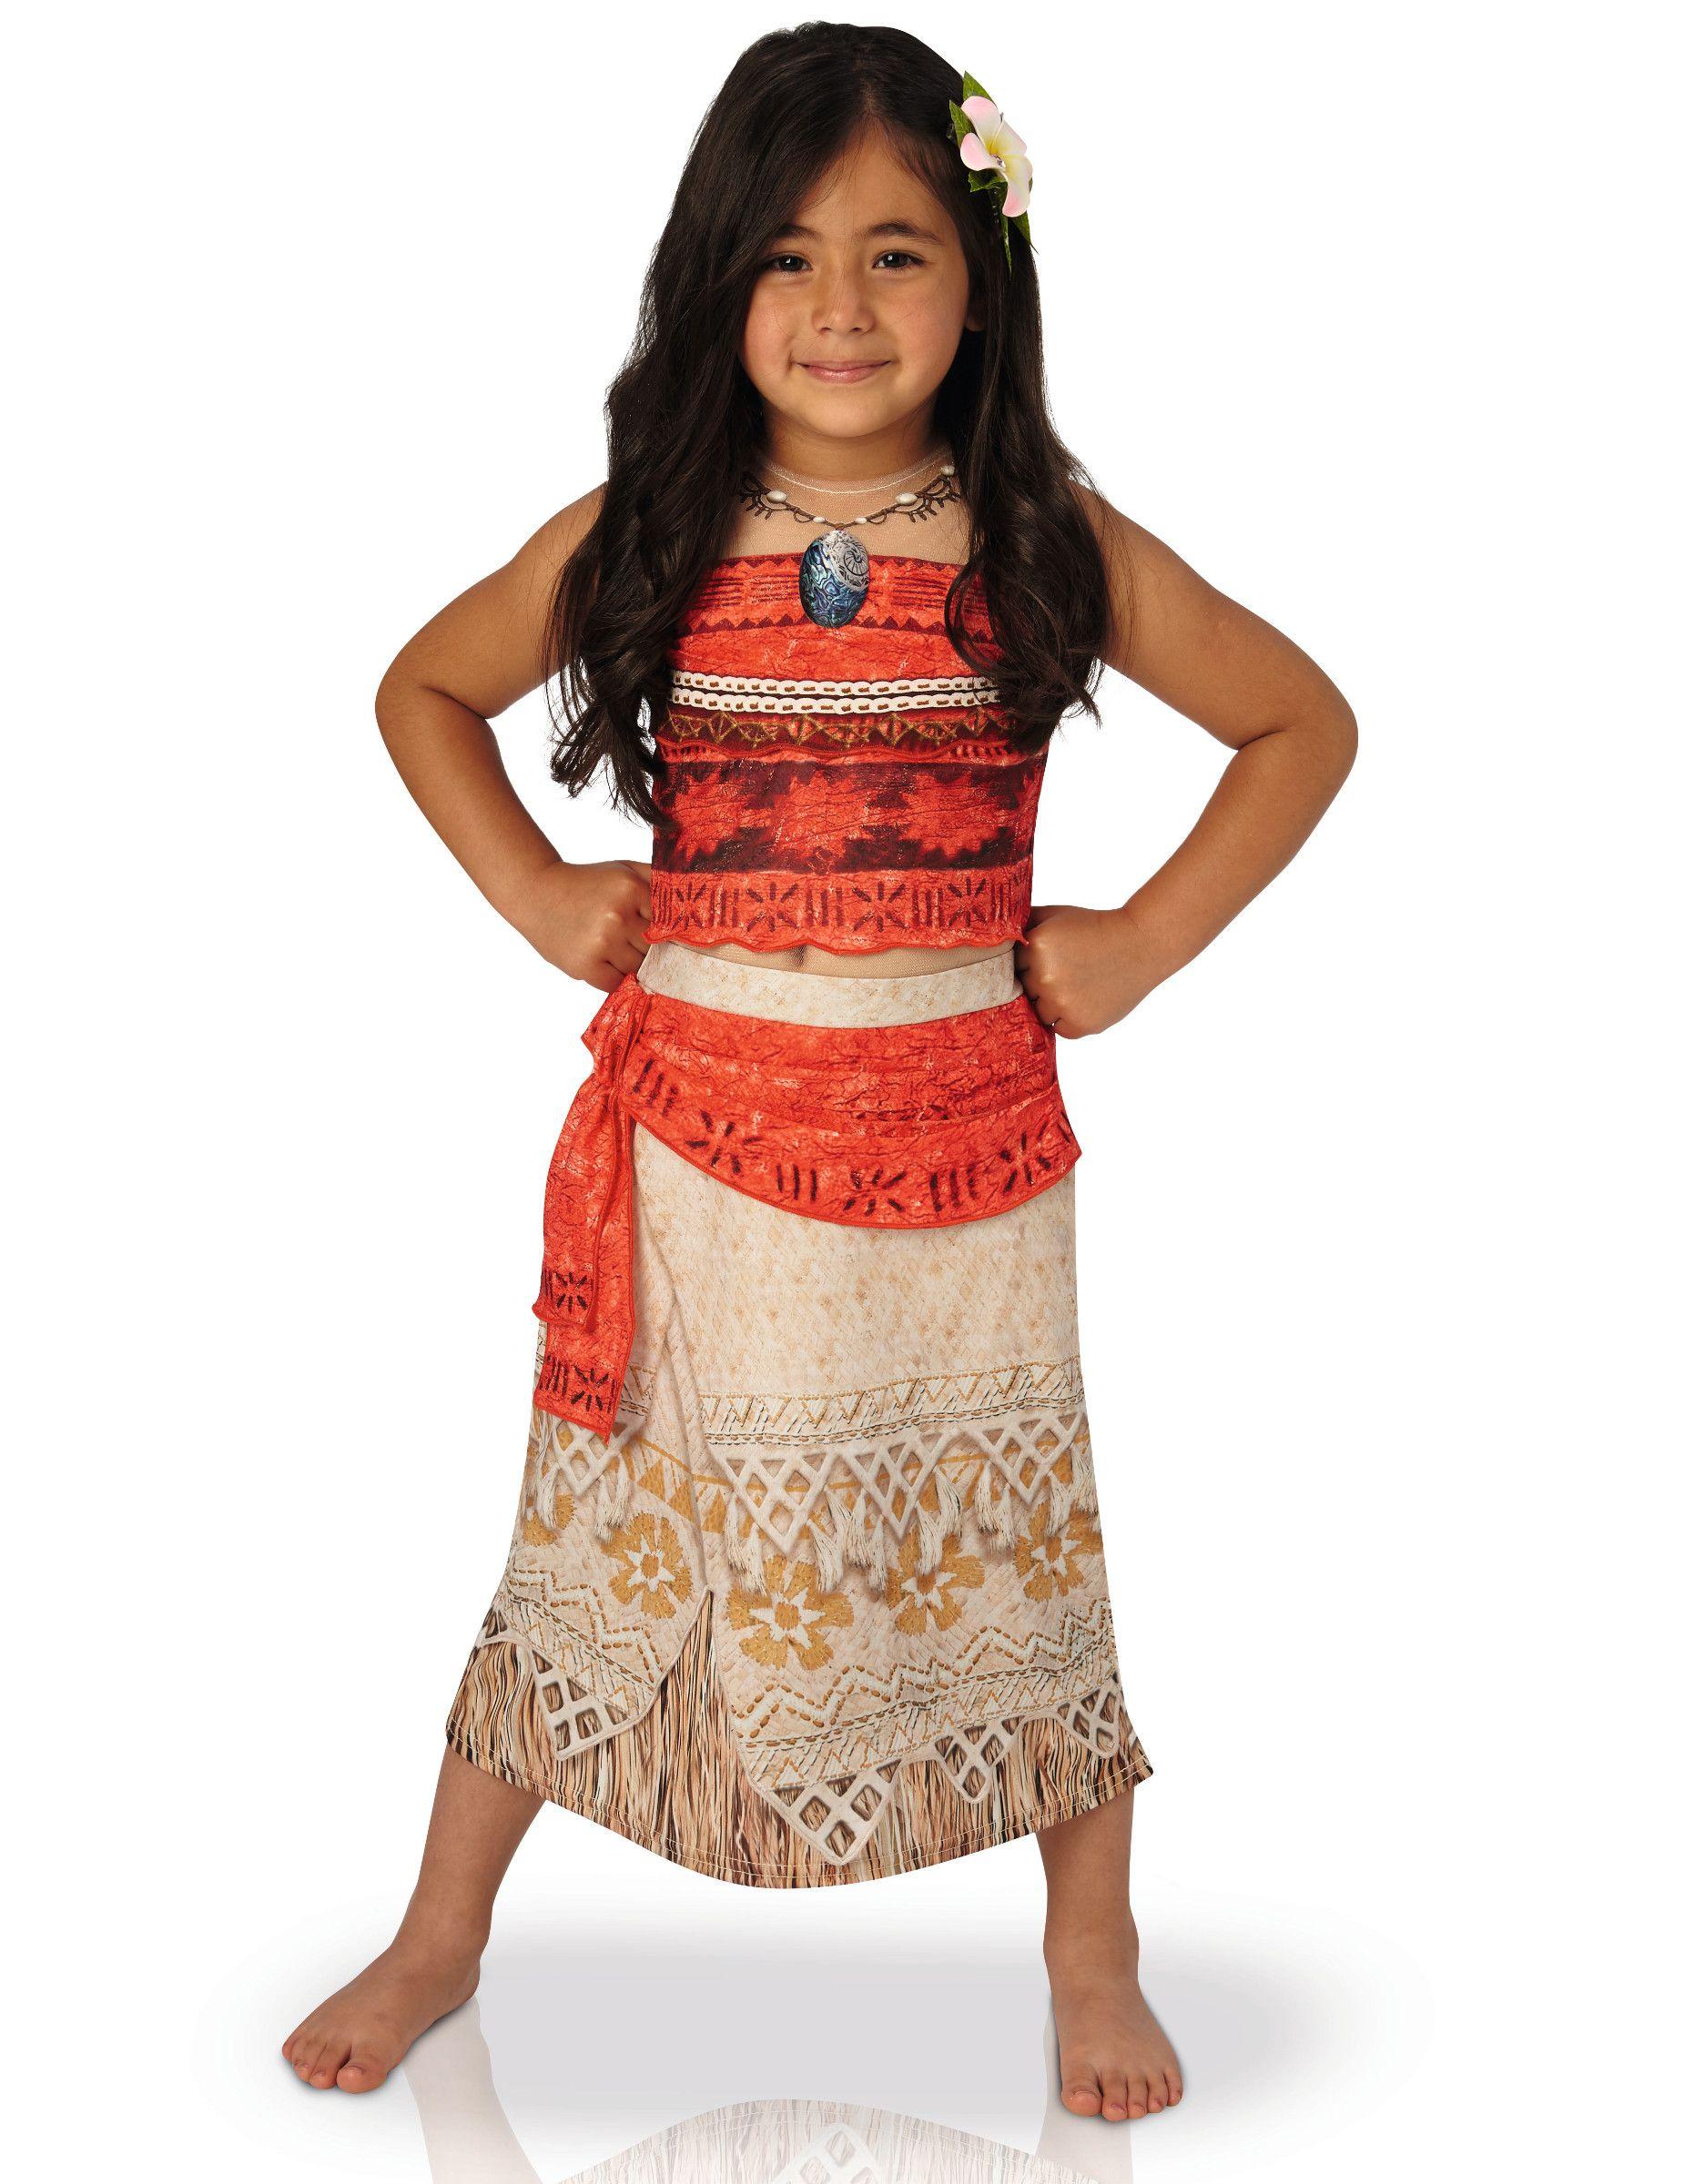 Girls Moana Costume Kids Disney Princess Fancy Dress Fairytale Licensed Dressup